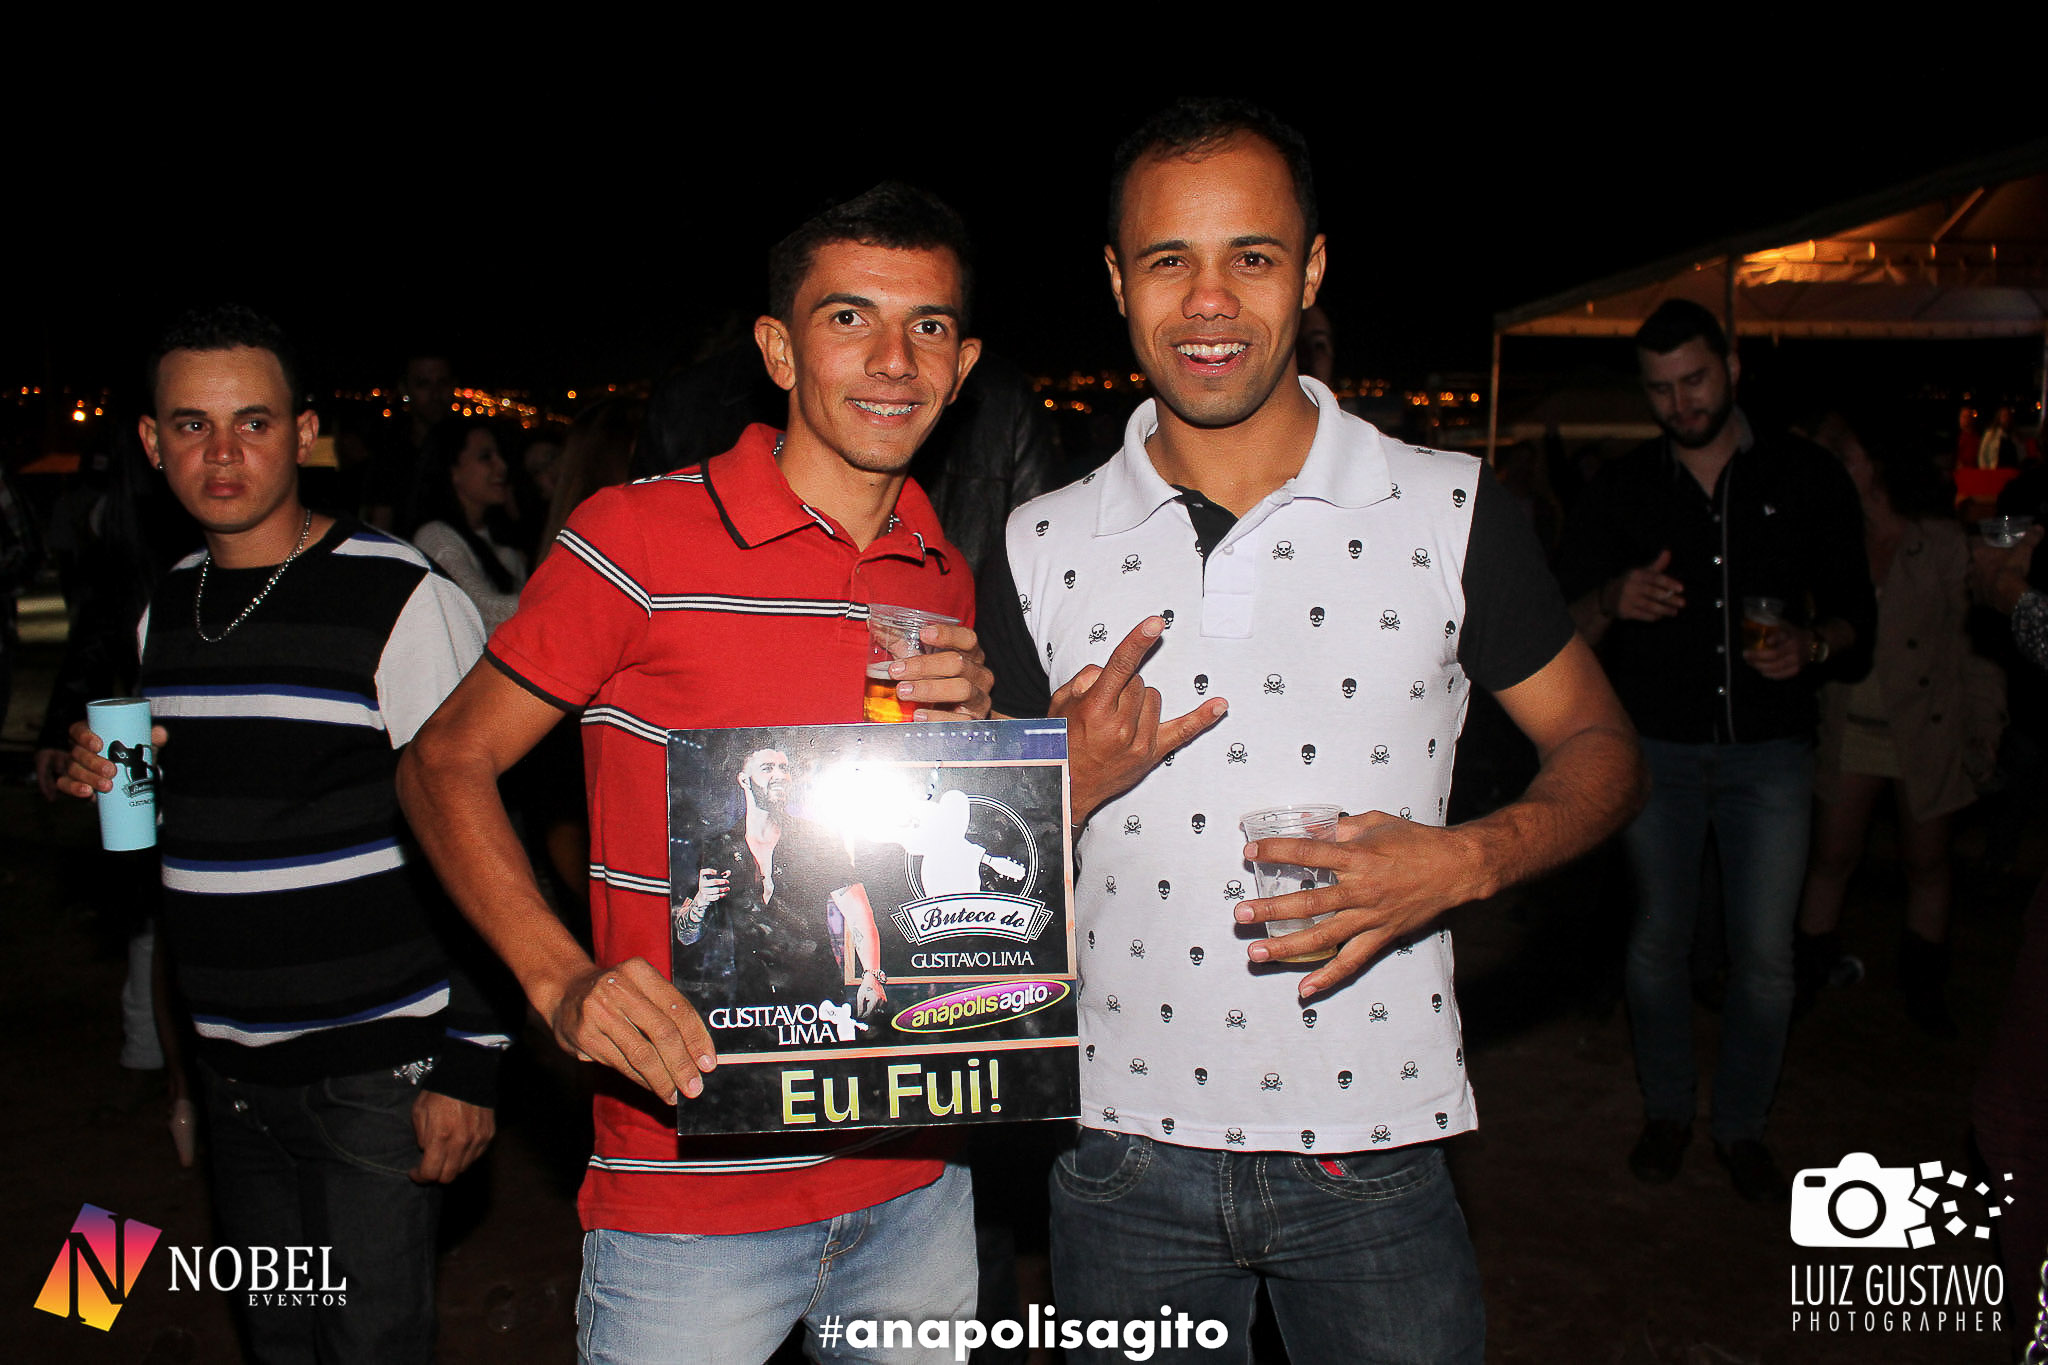 Luiz Gustavo Photographer-250